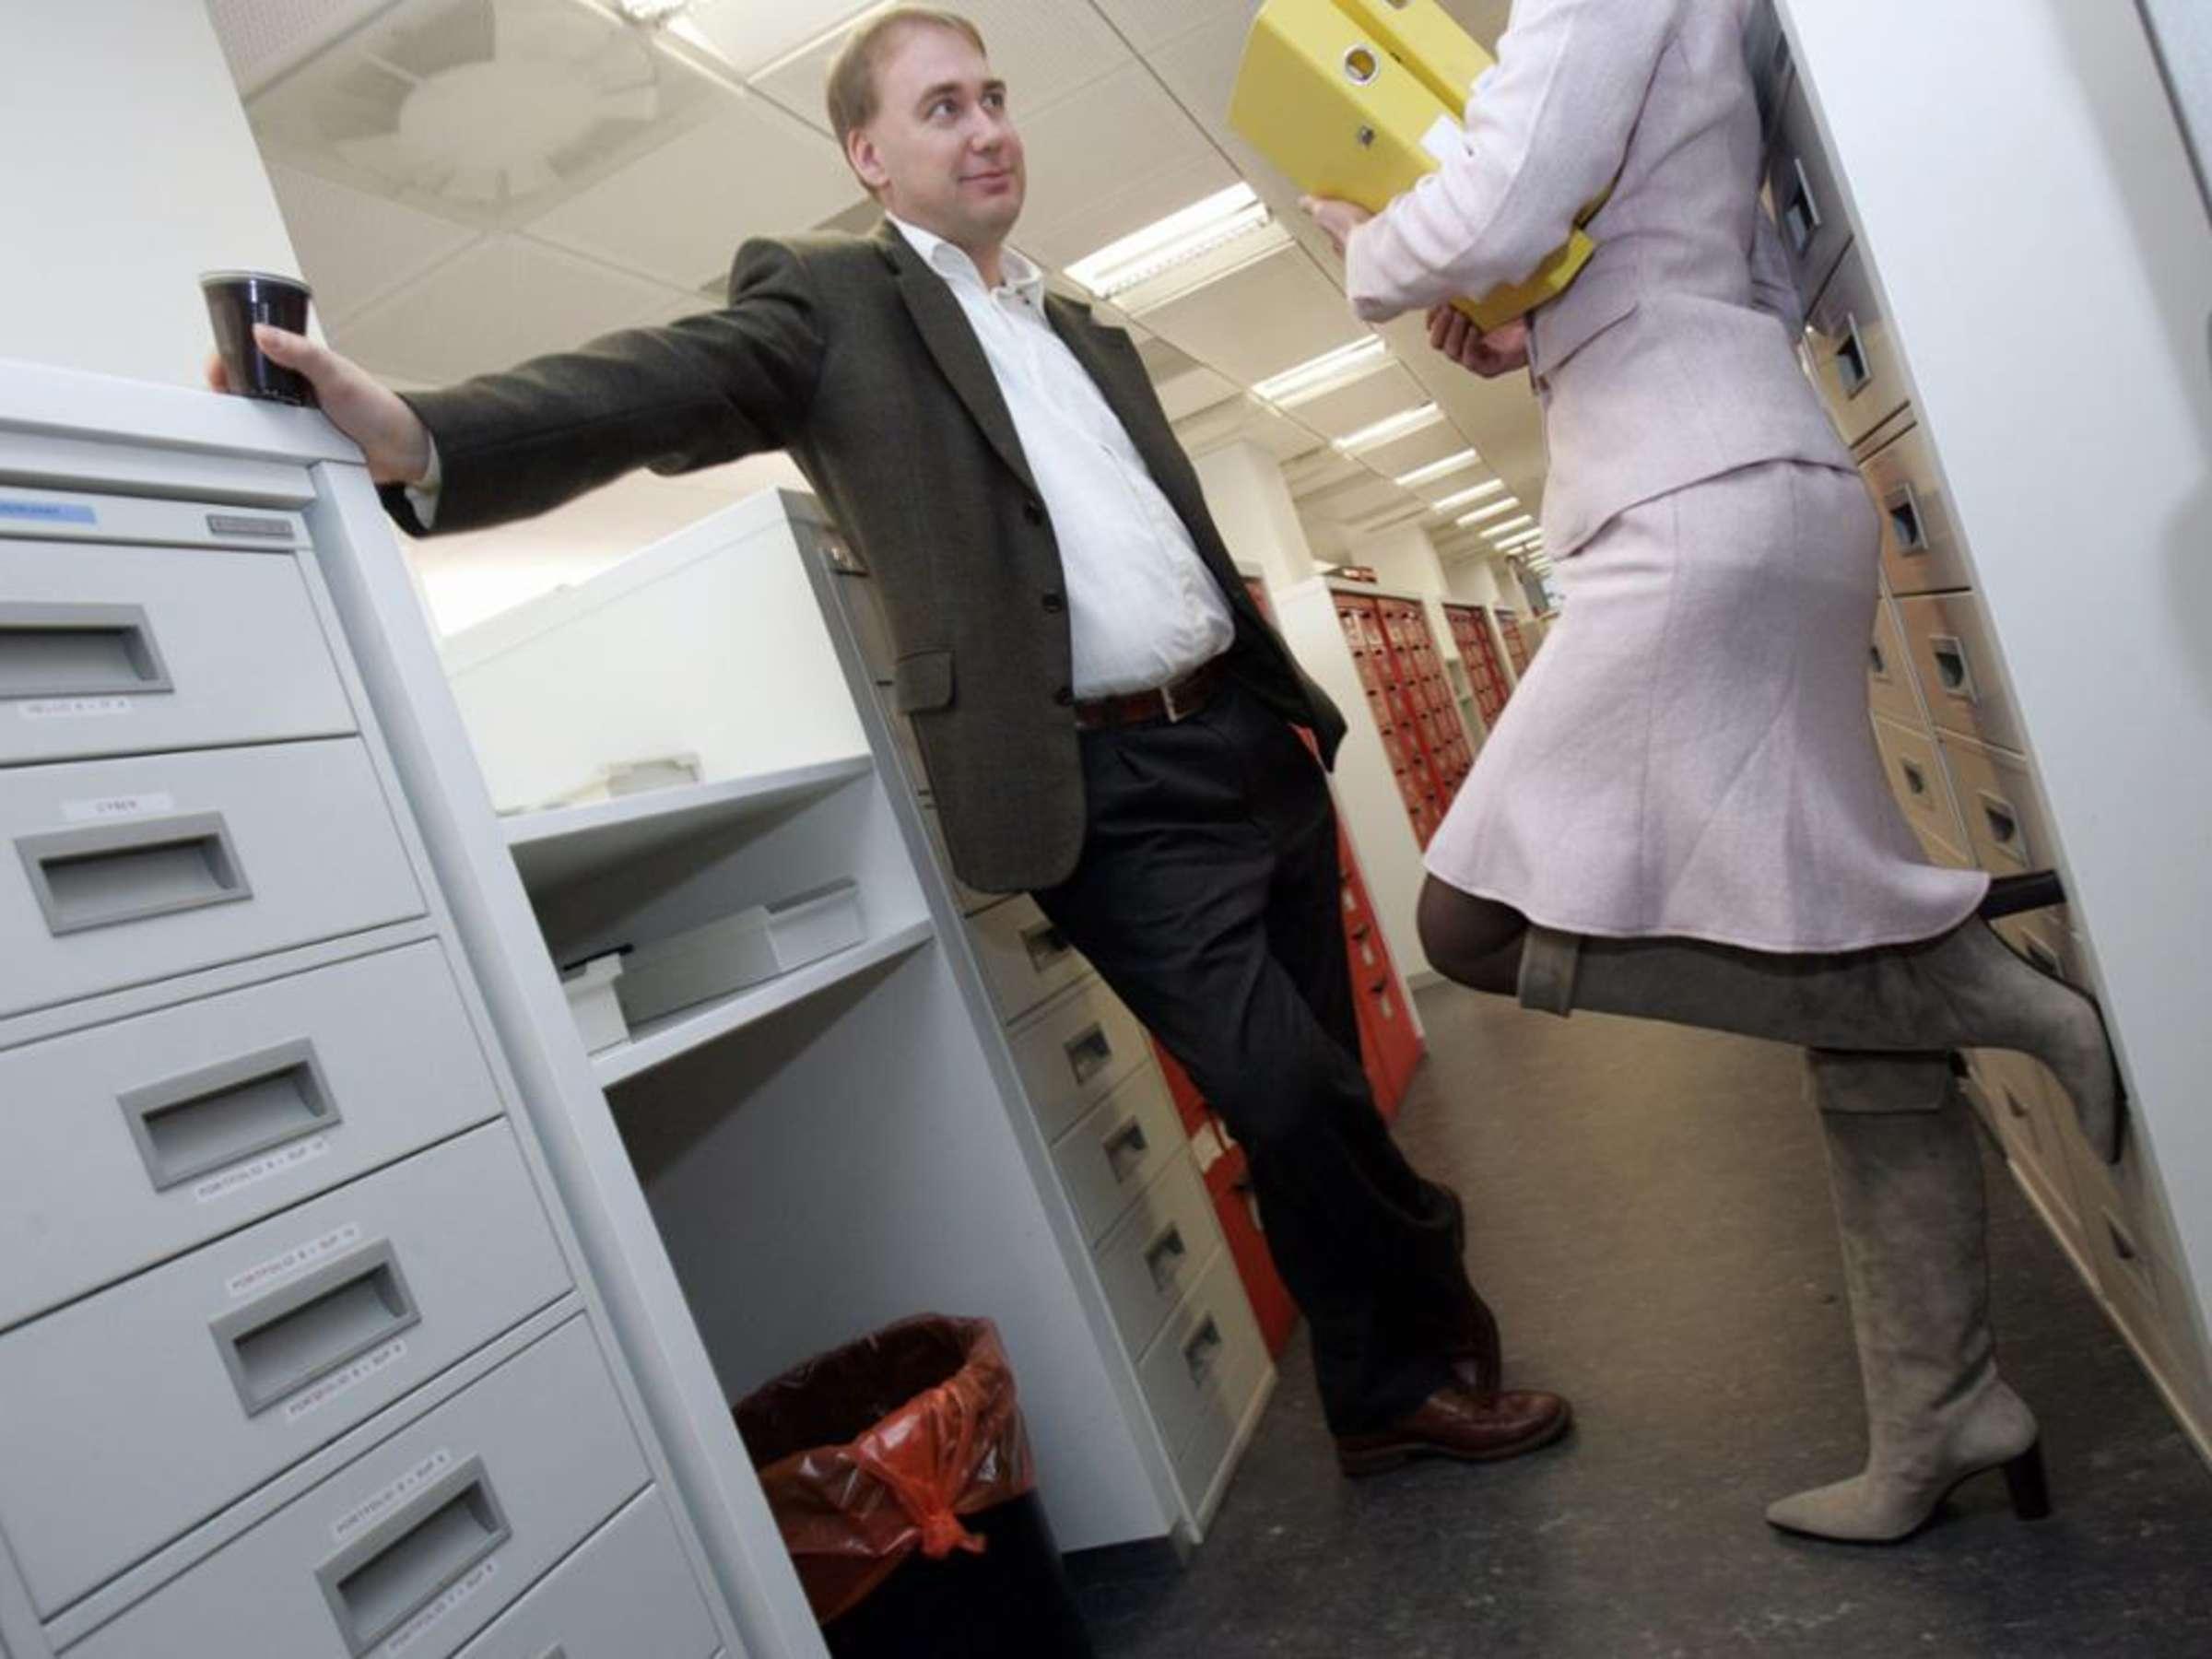 Romantik am Arbeitsplatz: Flirten per Mail und Liebe im Büro - healthraport.de